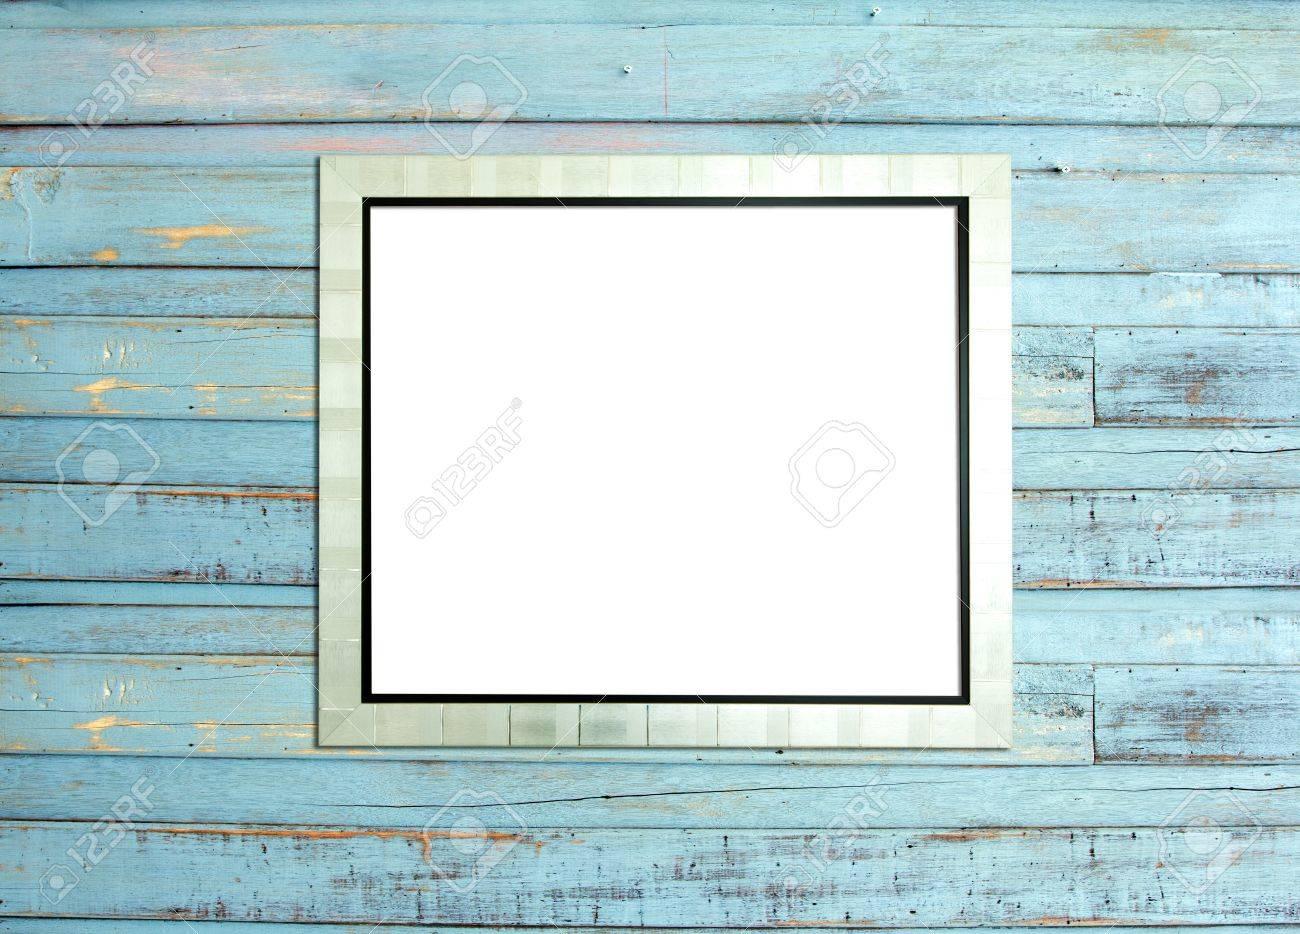 silber vintage bilderrahmen, holz vergoldet, blau holz hintergrund, Moderne